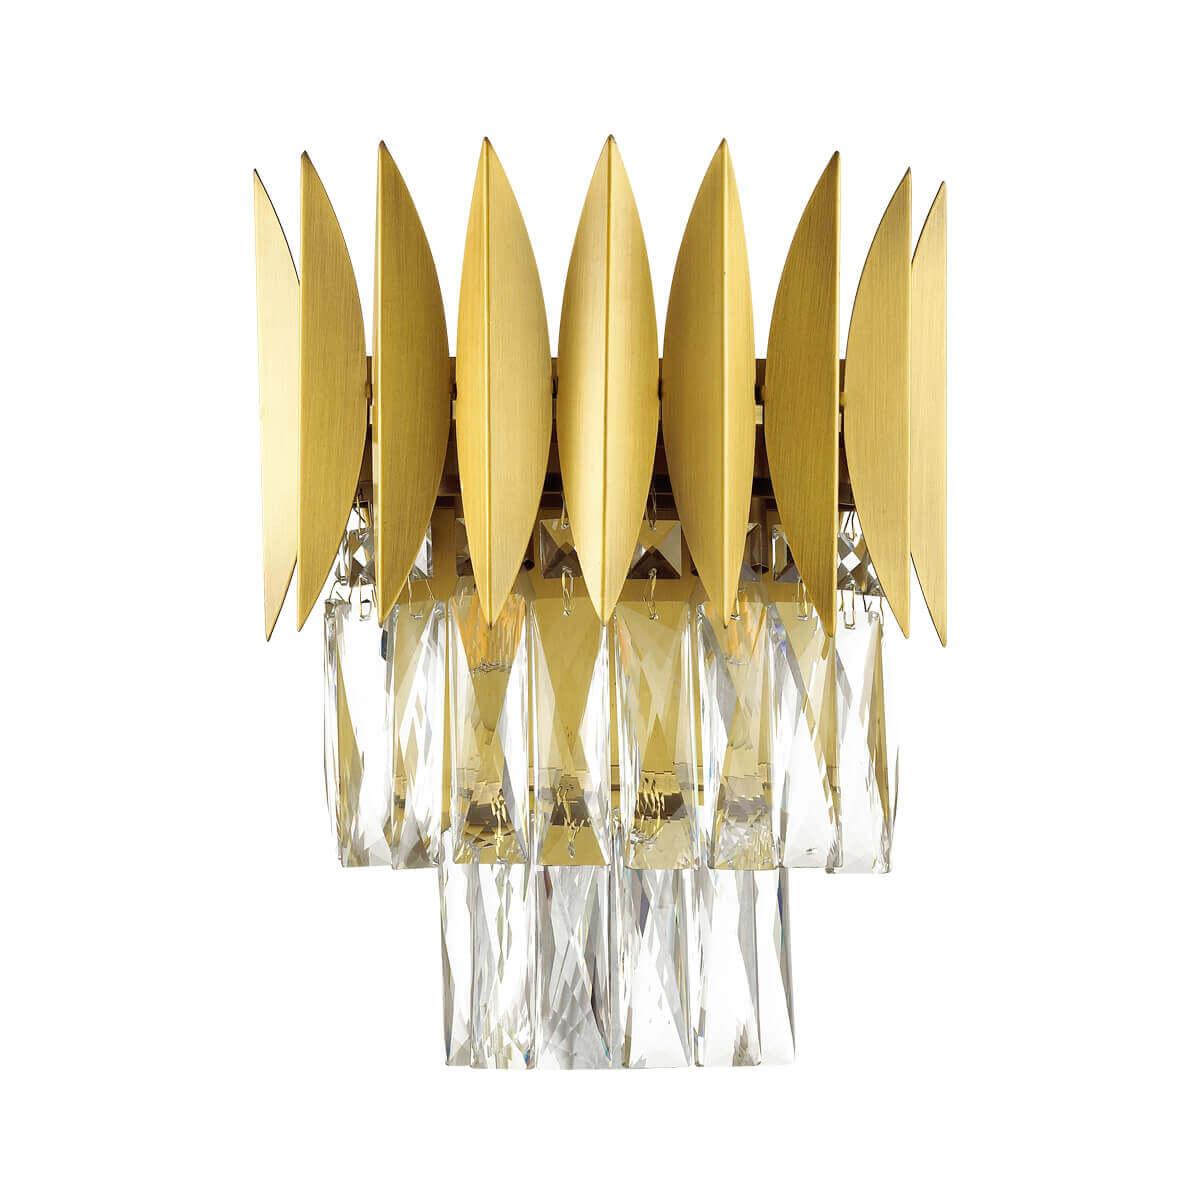 Светильник Odeon Light 4124/2W Hall бра lumien hall lh1054 2w nk wt монелья